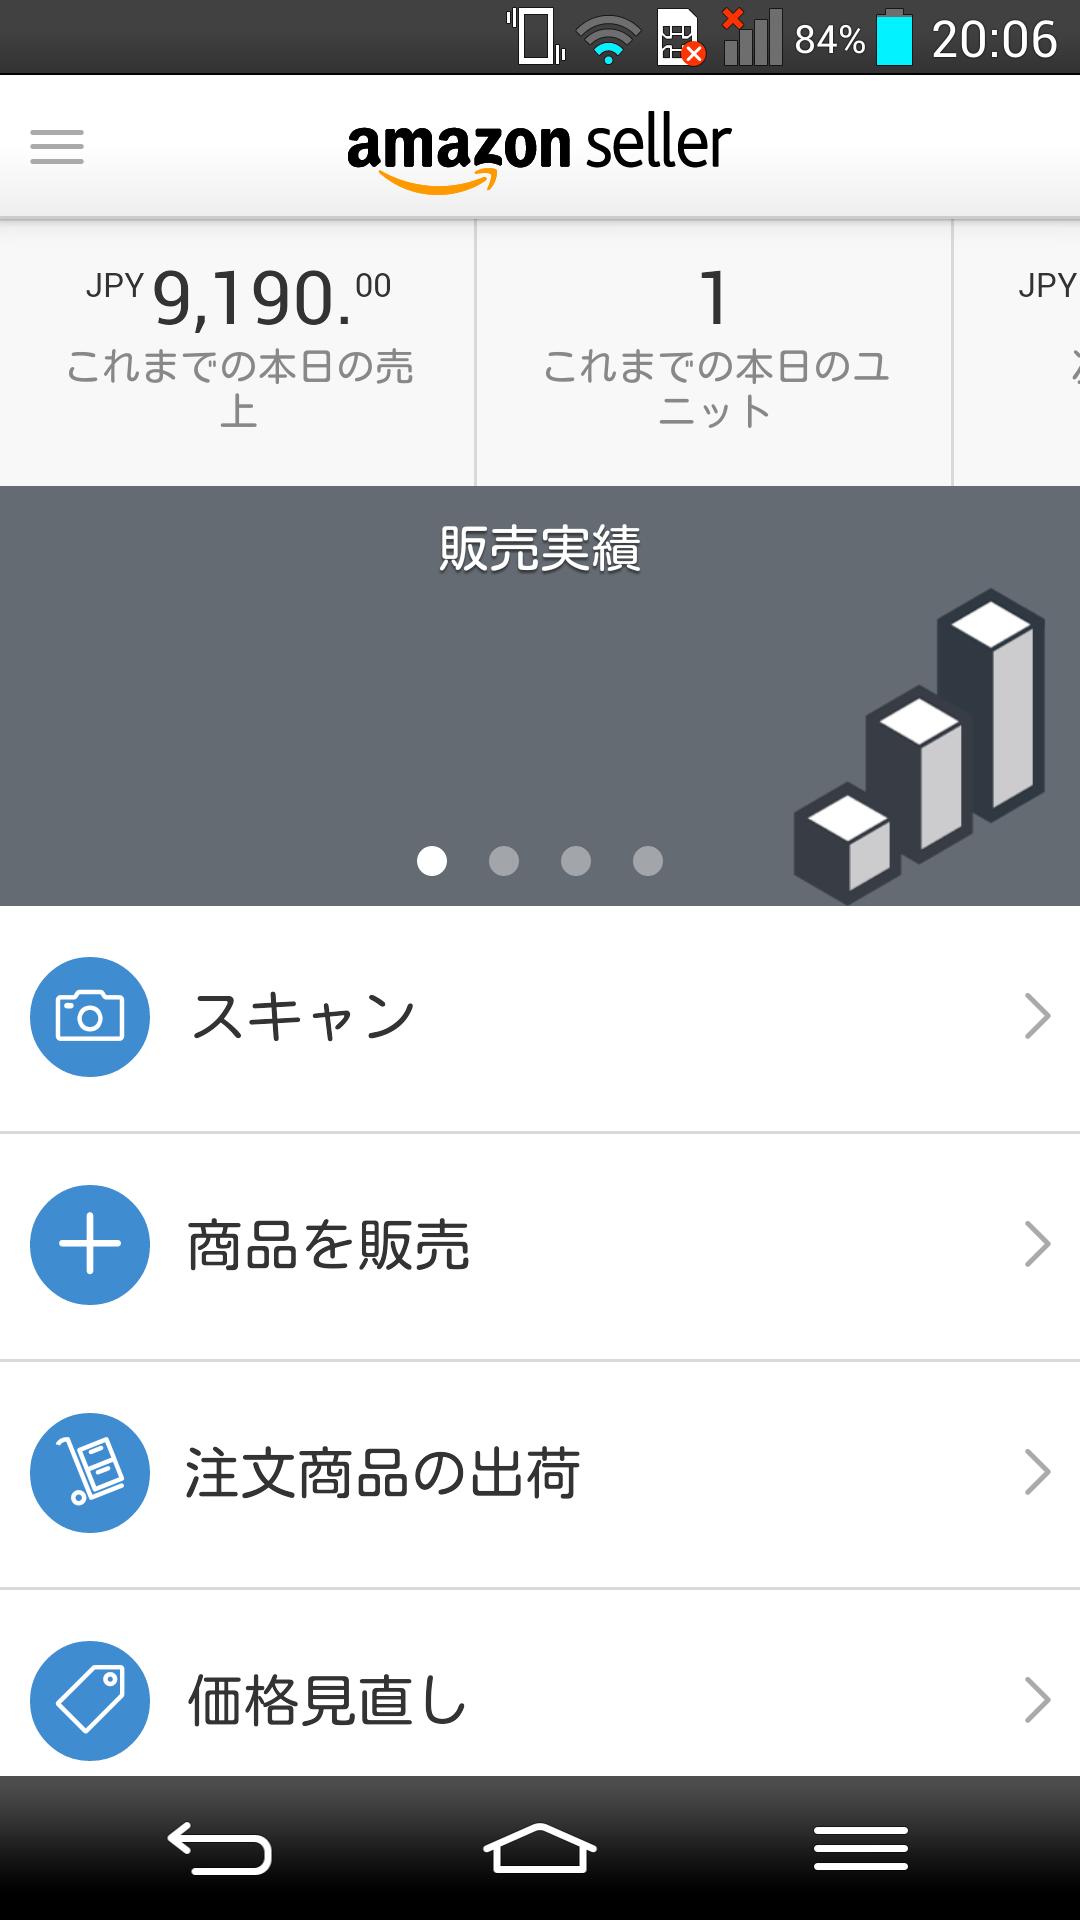 Screenshot_2016-06-29-20-06-51